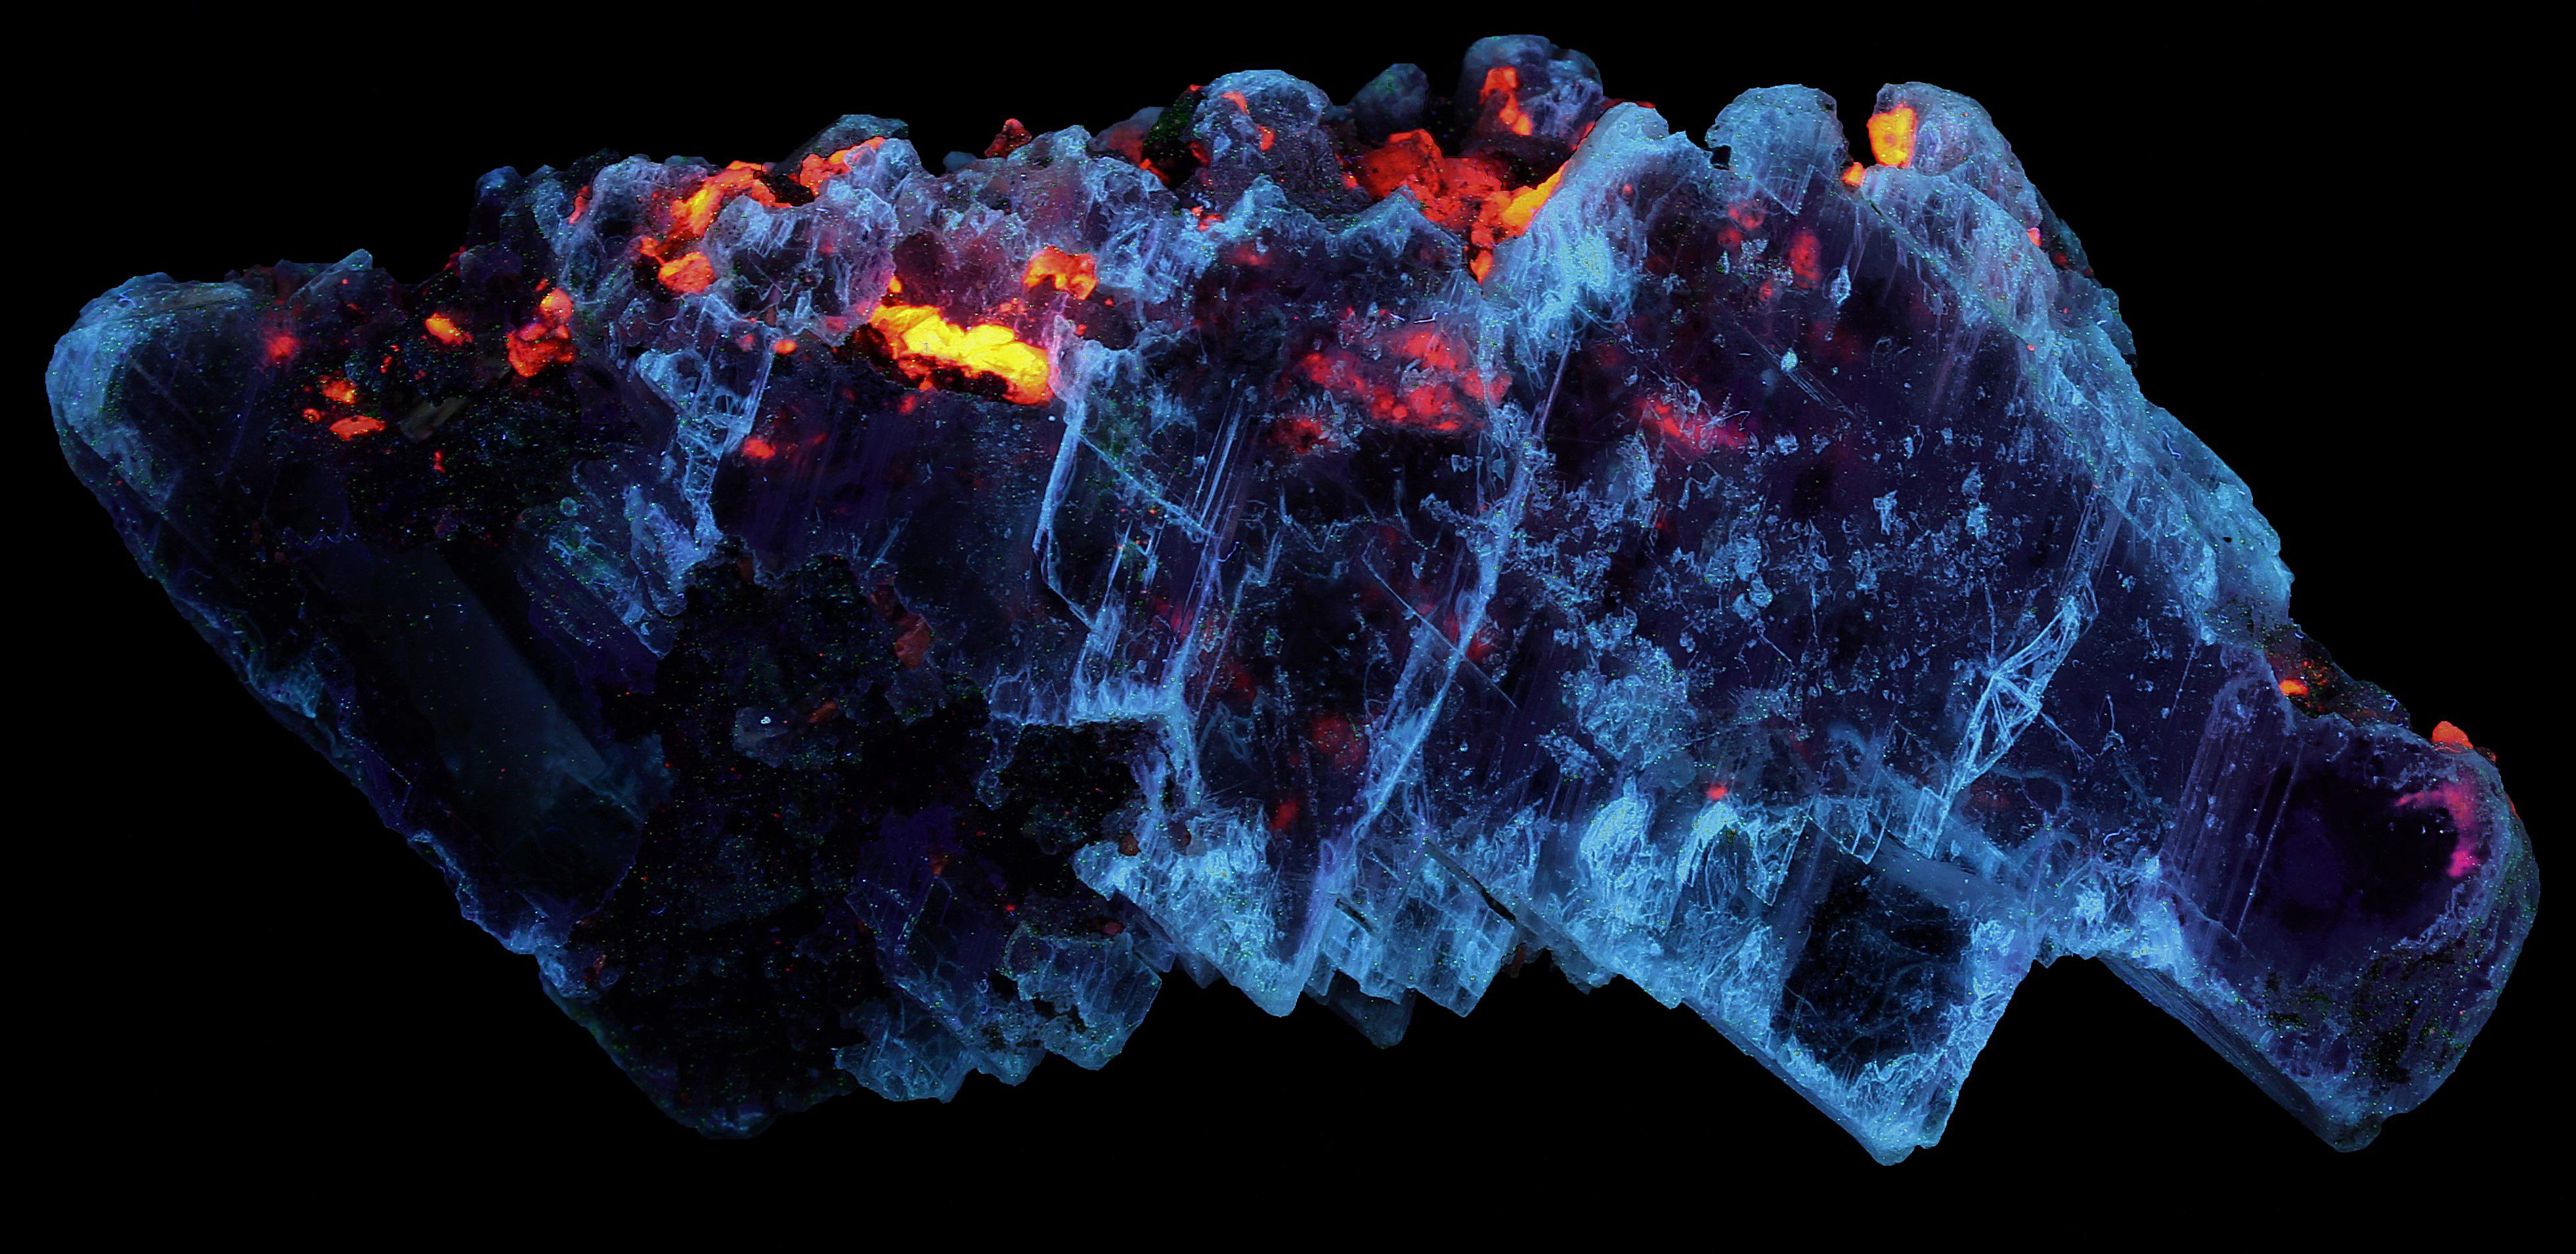 Gypsum (selenite), franklinite and calcite from the Sterling Hill Mine, NJ under shortwave UV Light